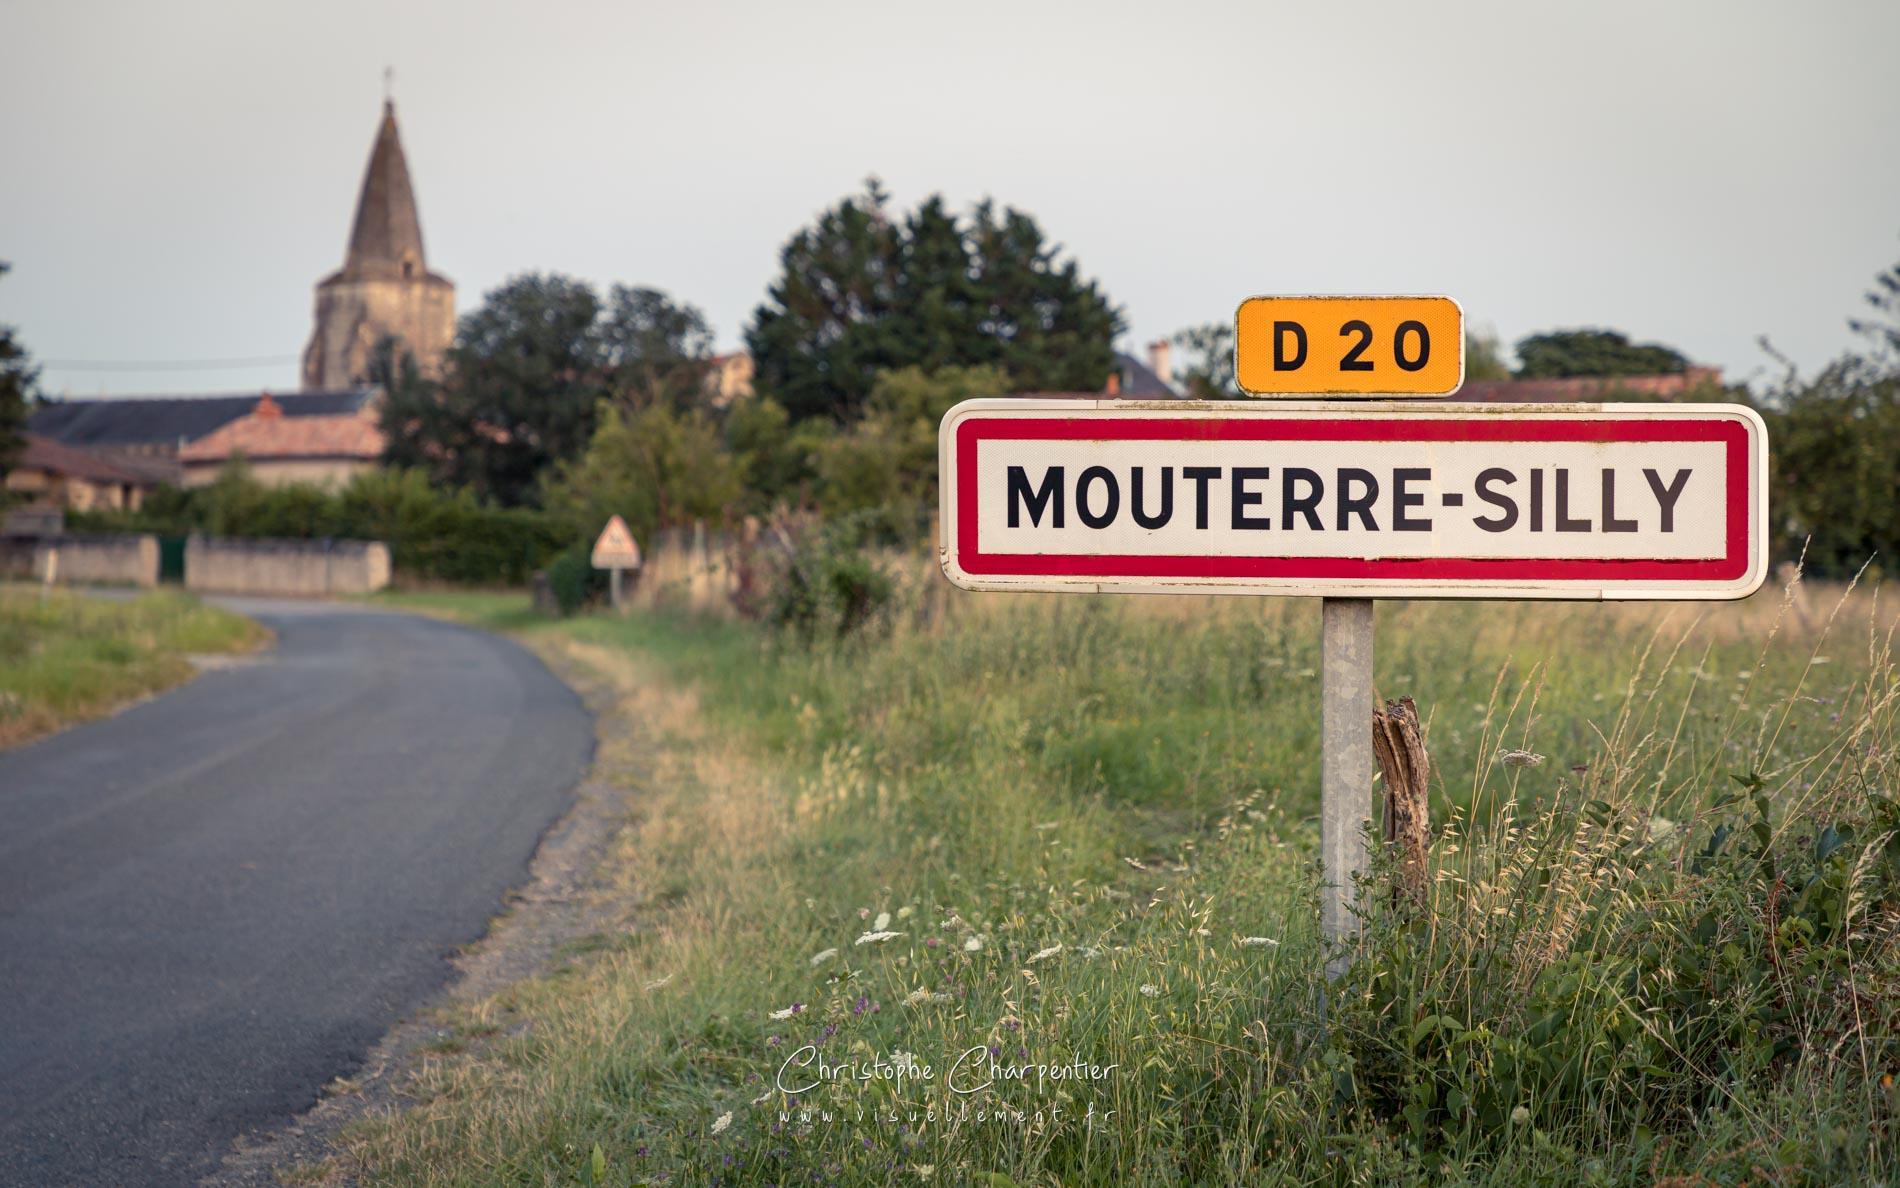 mouterre-silly-village-france-patrimoine (8)